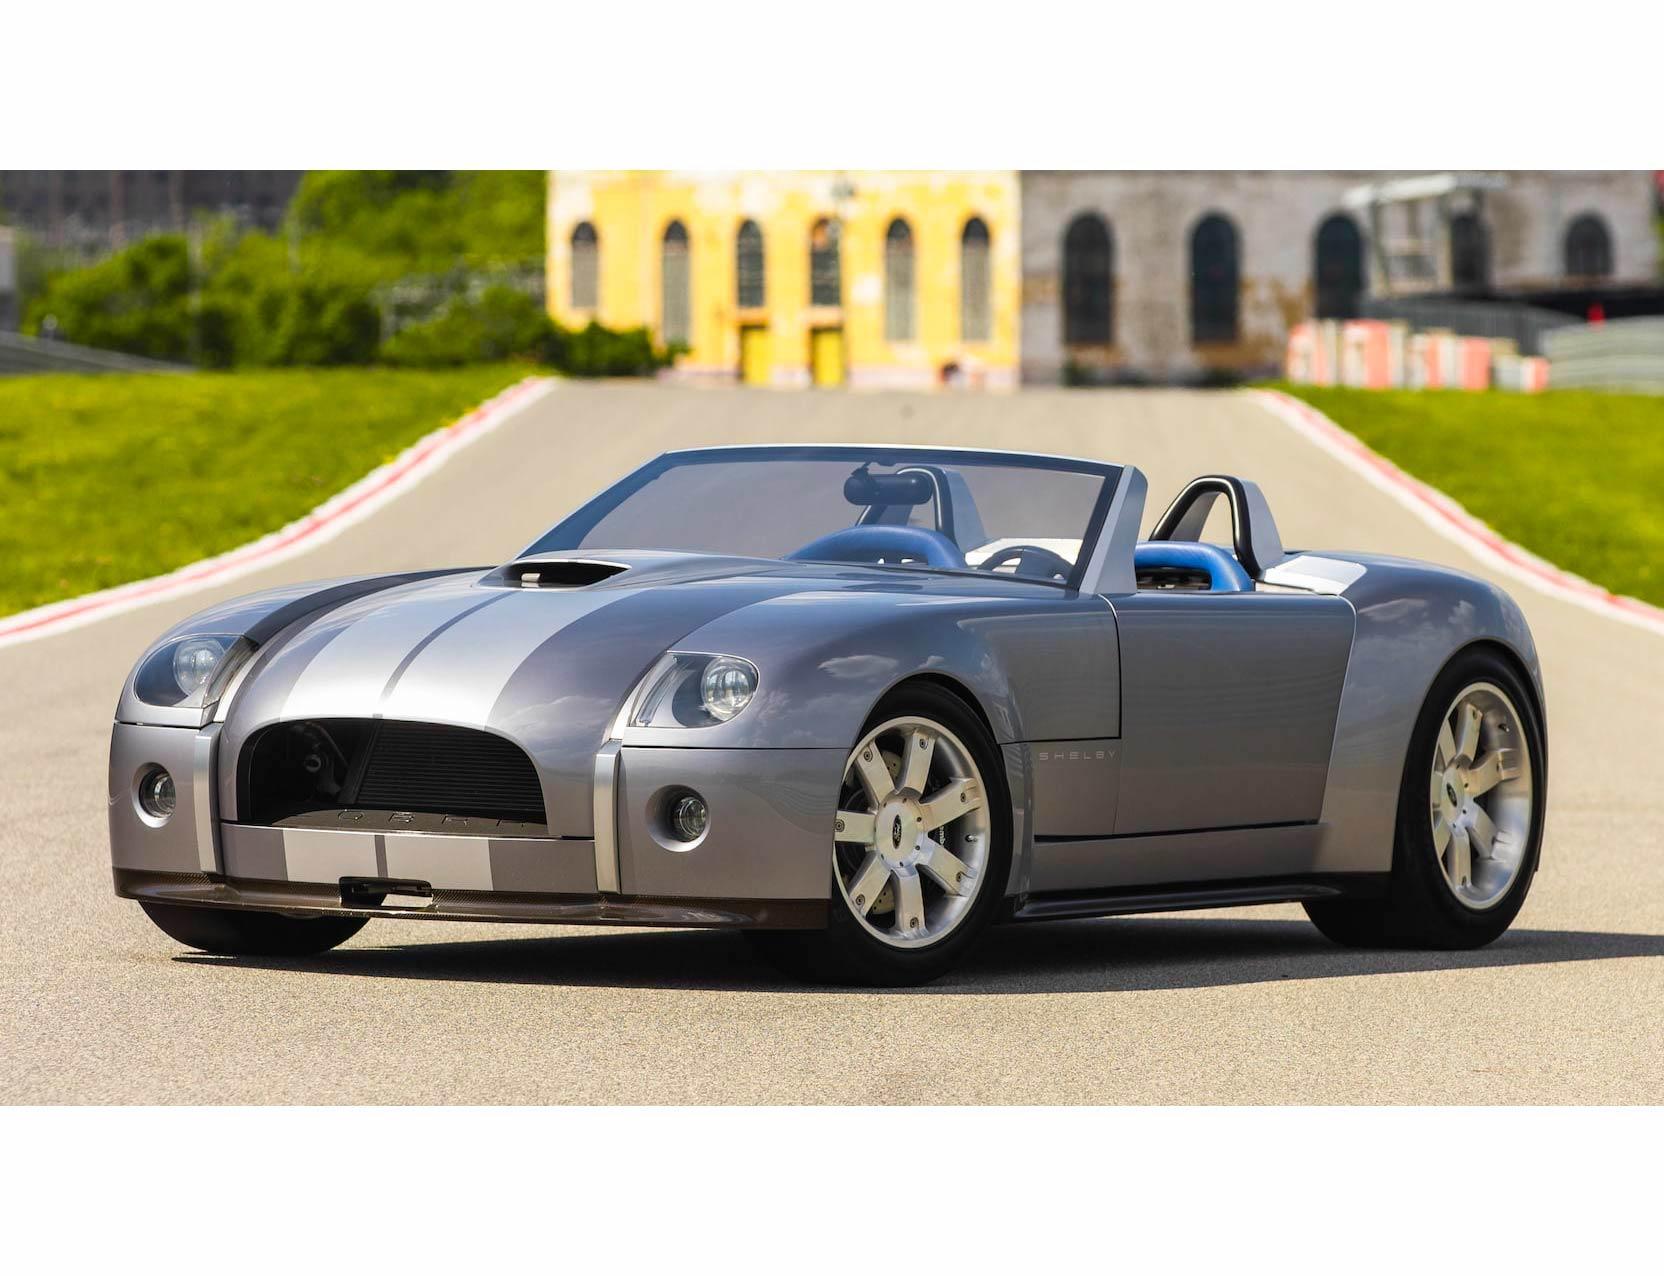 Ford Shelby Cobra Concept Daisy